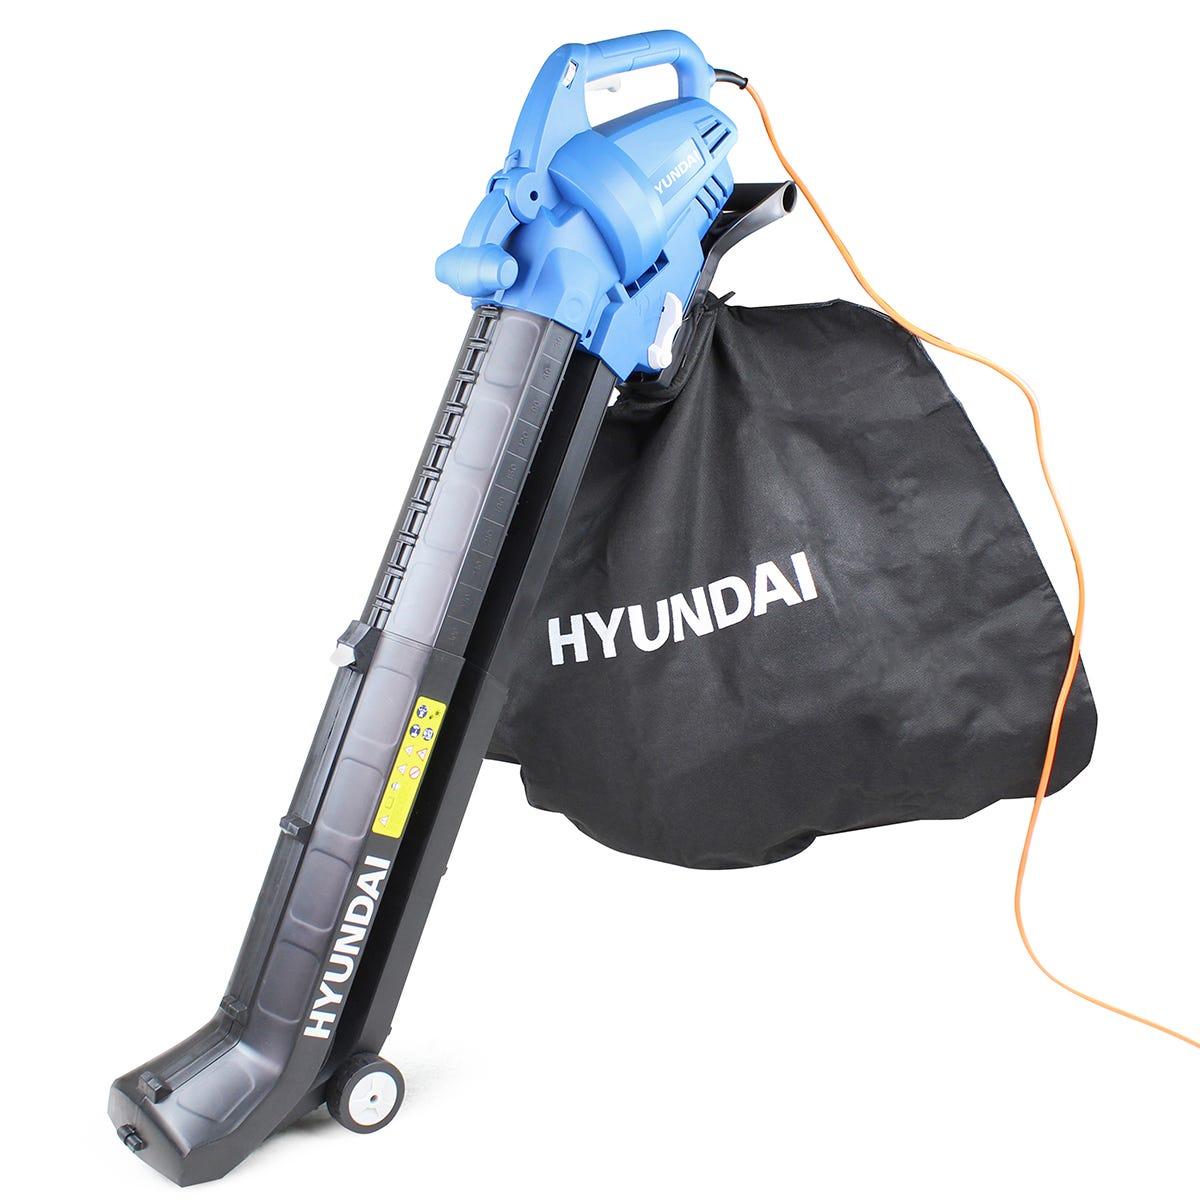 Hyundai HYBV3000E 3000W 3-in-1 Leaf Blower, Garden Vacuum & Shredder with 45L Collection Bag